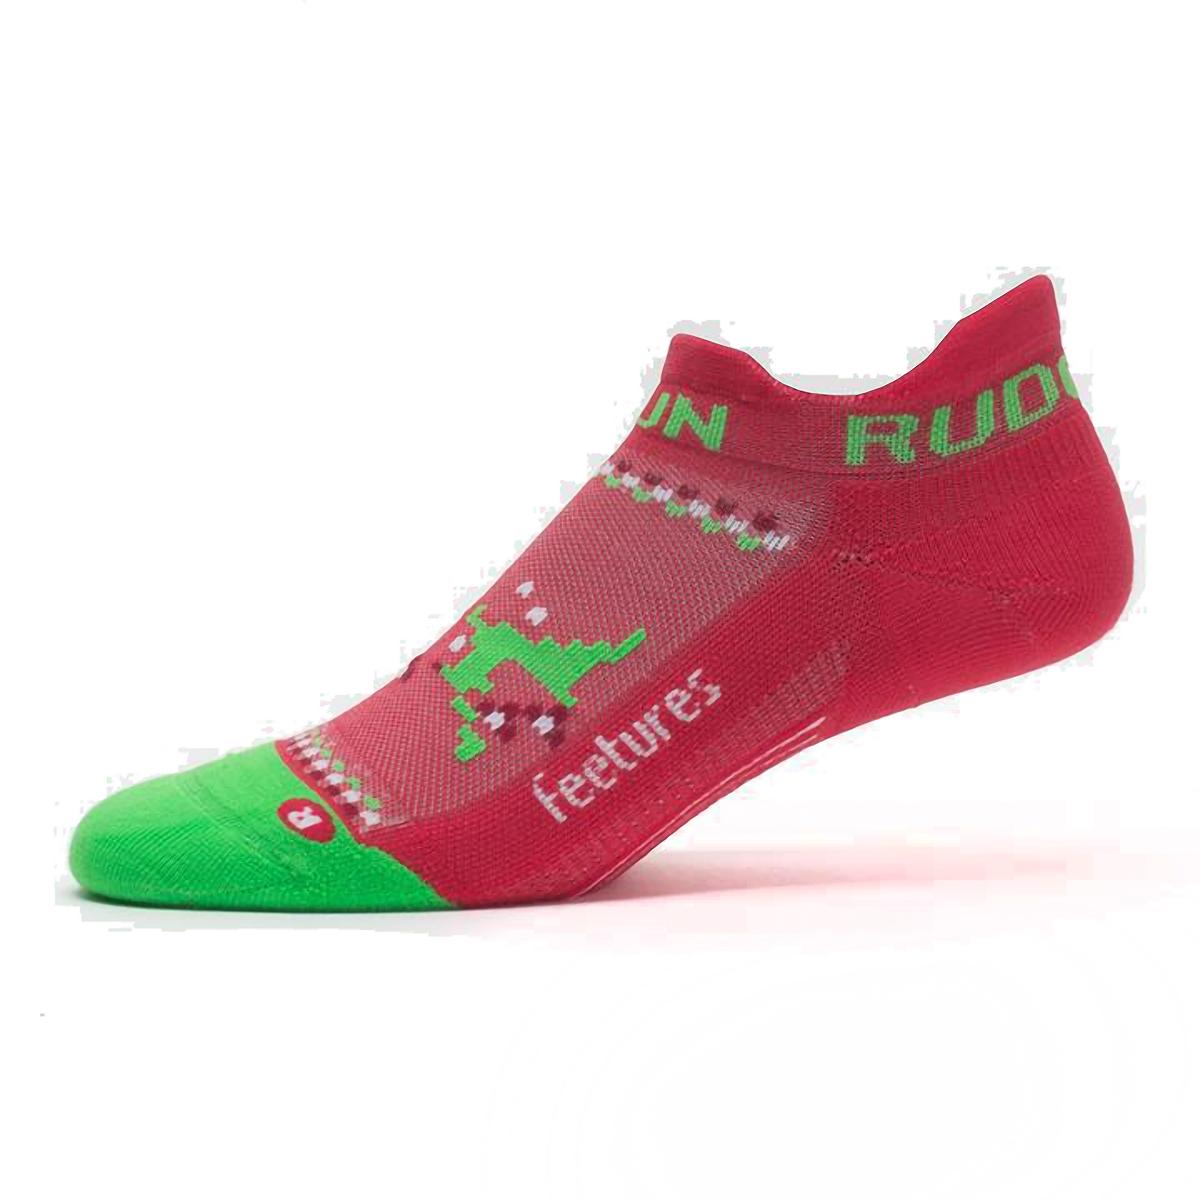 Feetures Elite Light Cushion No Show Tab Socks - Color: Run Rudolph - Size: S, Run Rudolph, large, image 2